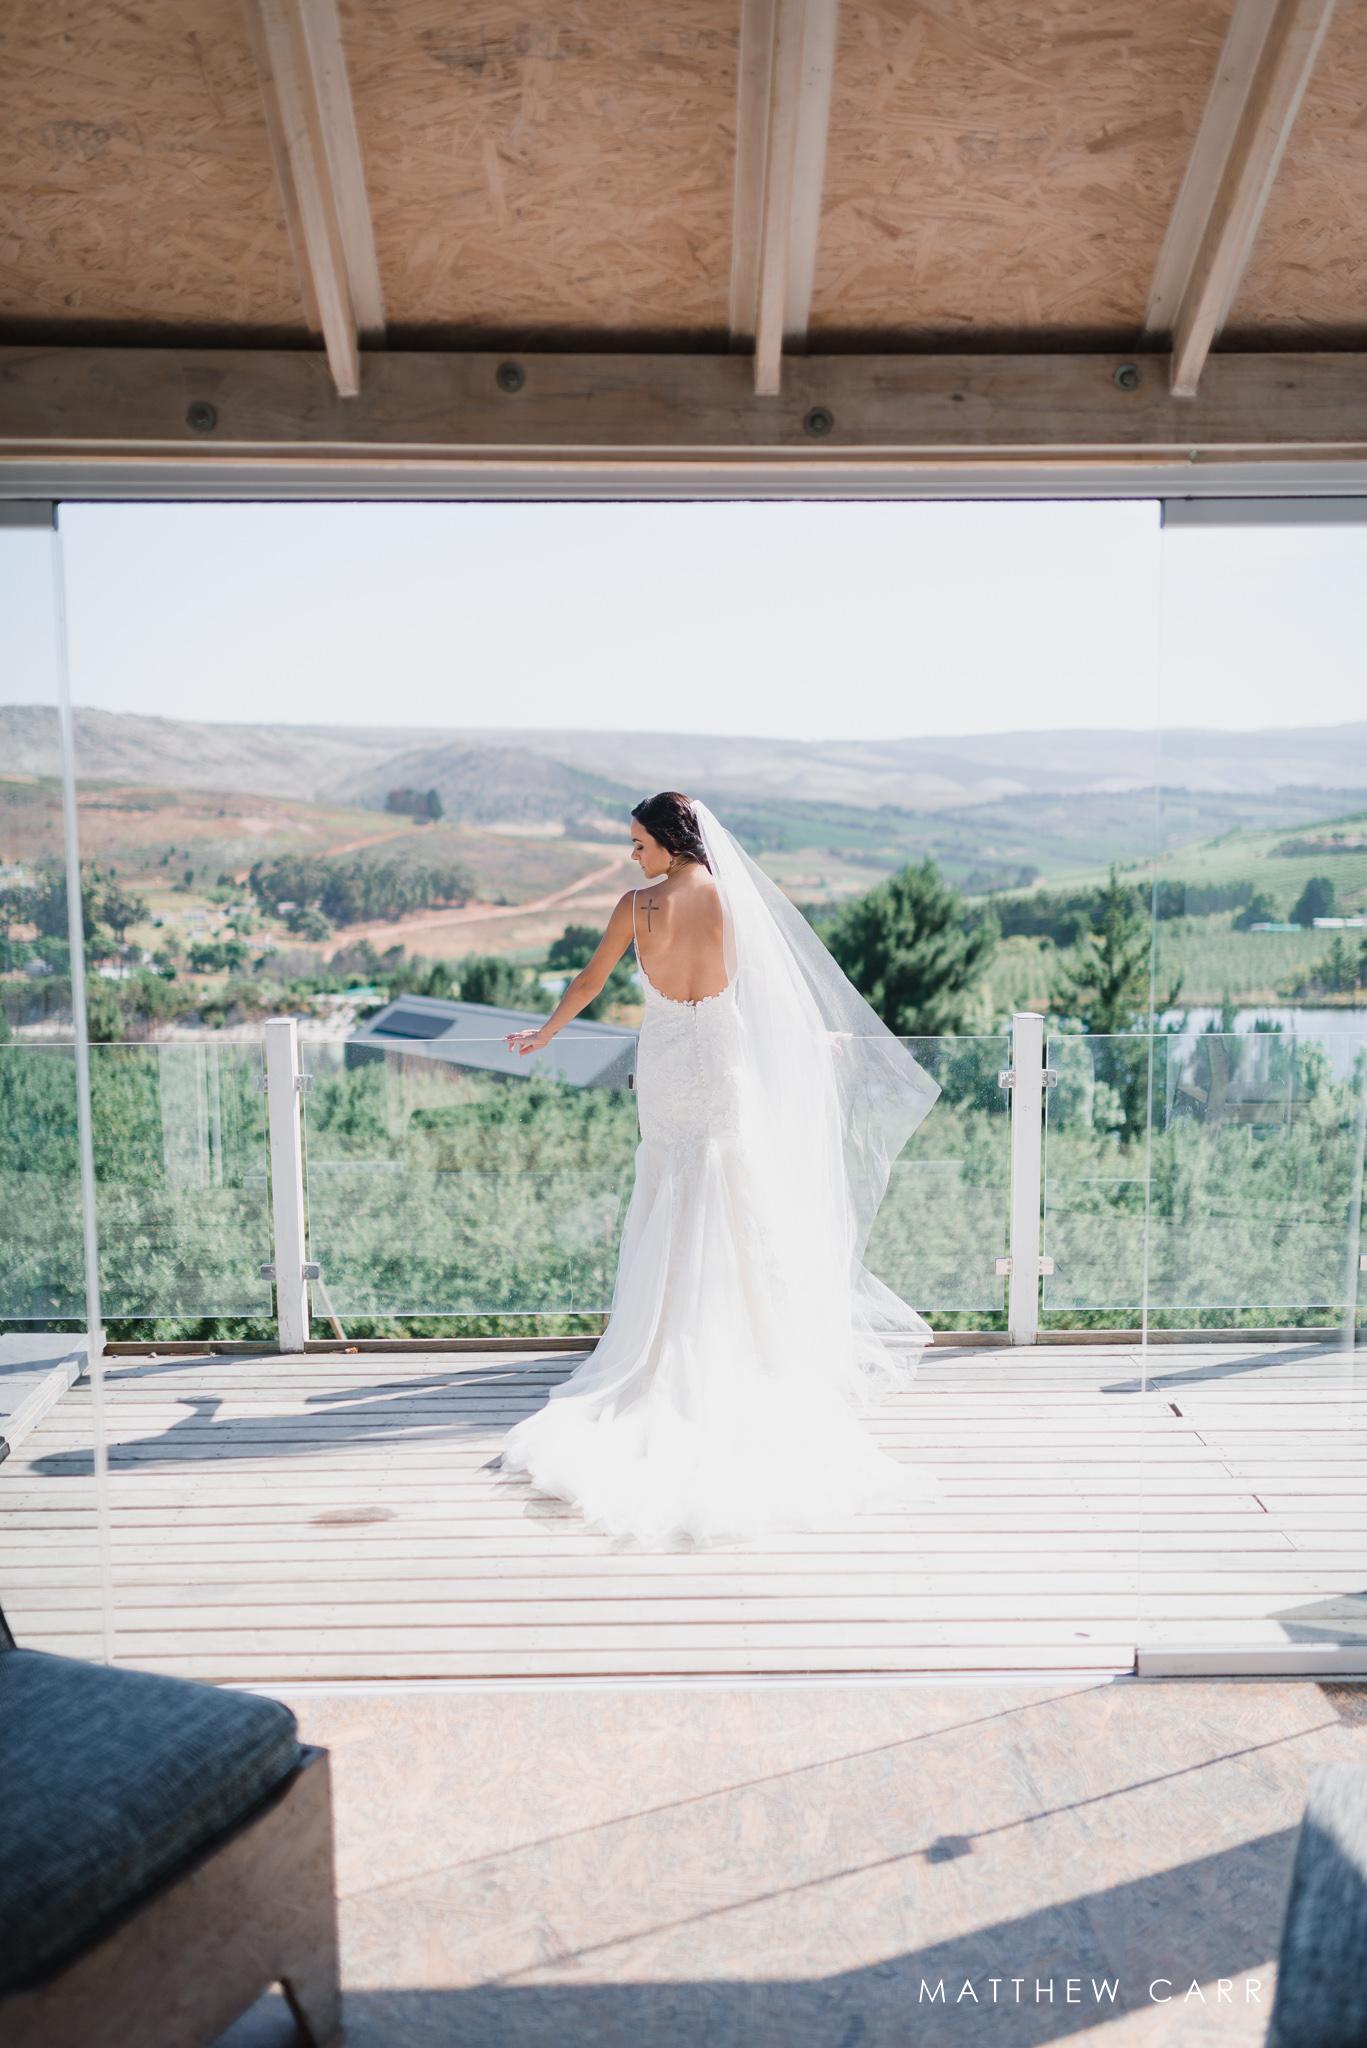 wedding prep - low res (viewing, social media) (270 of 276).JPG